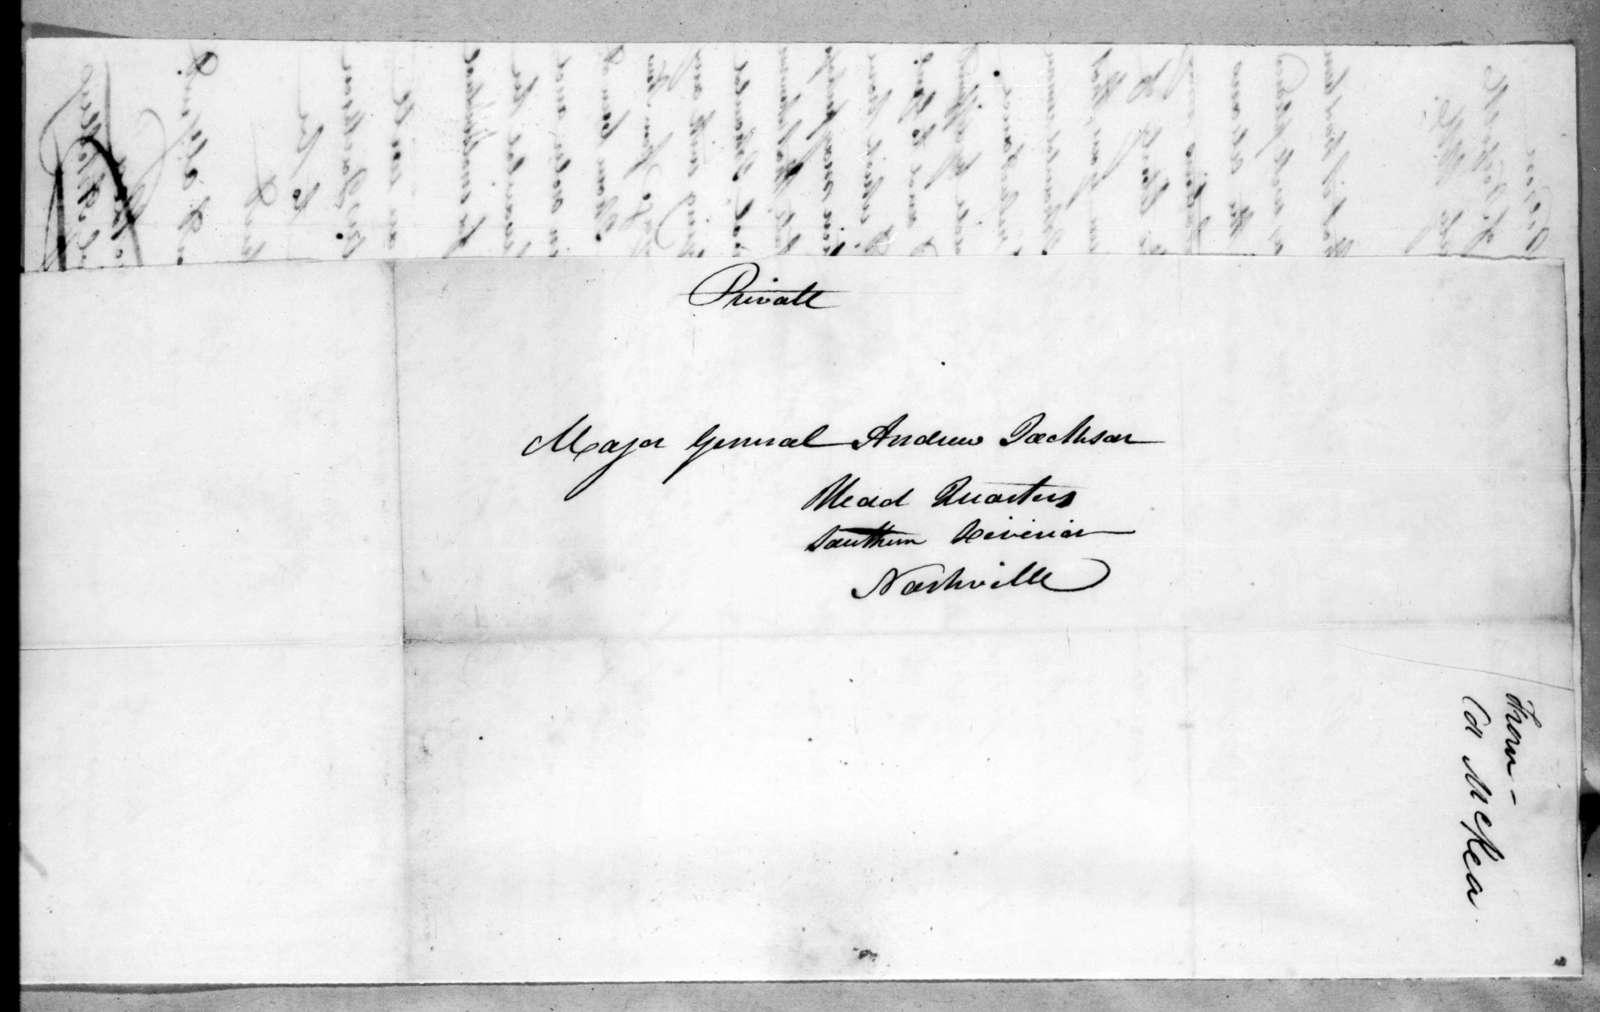 William MacRea to Andrew Jackson, July 25, 1816